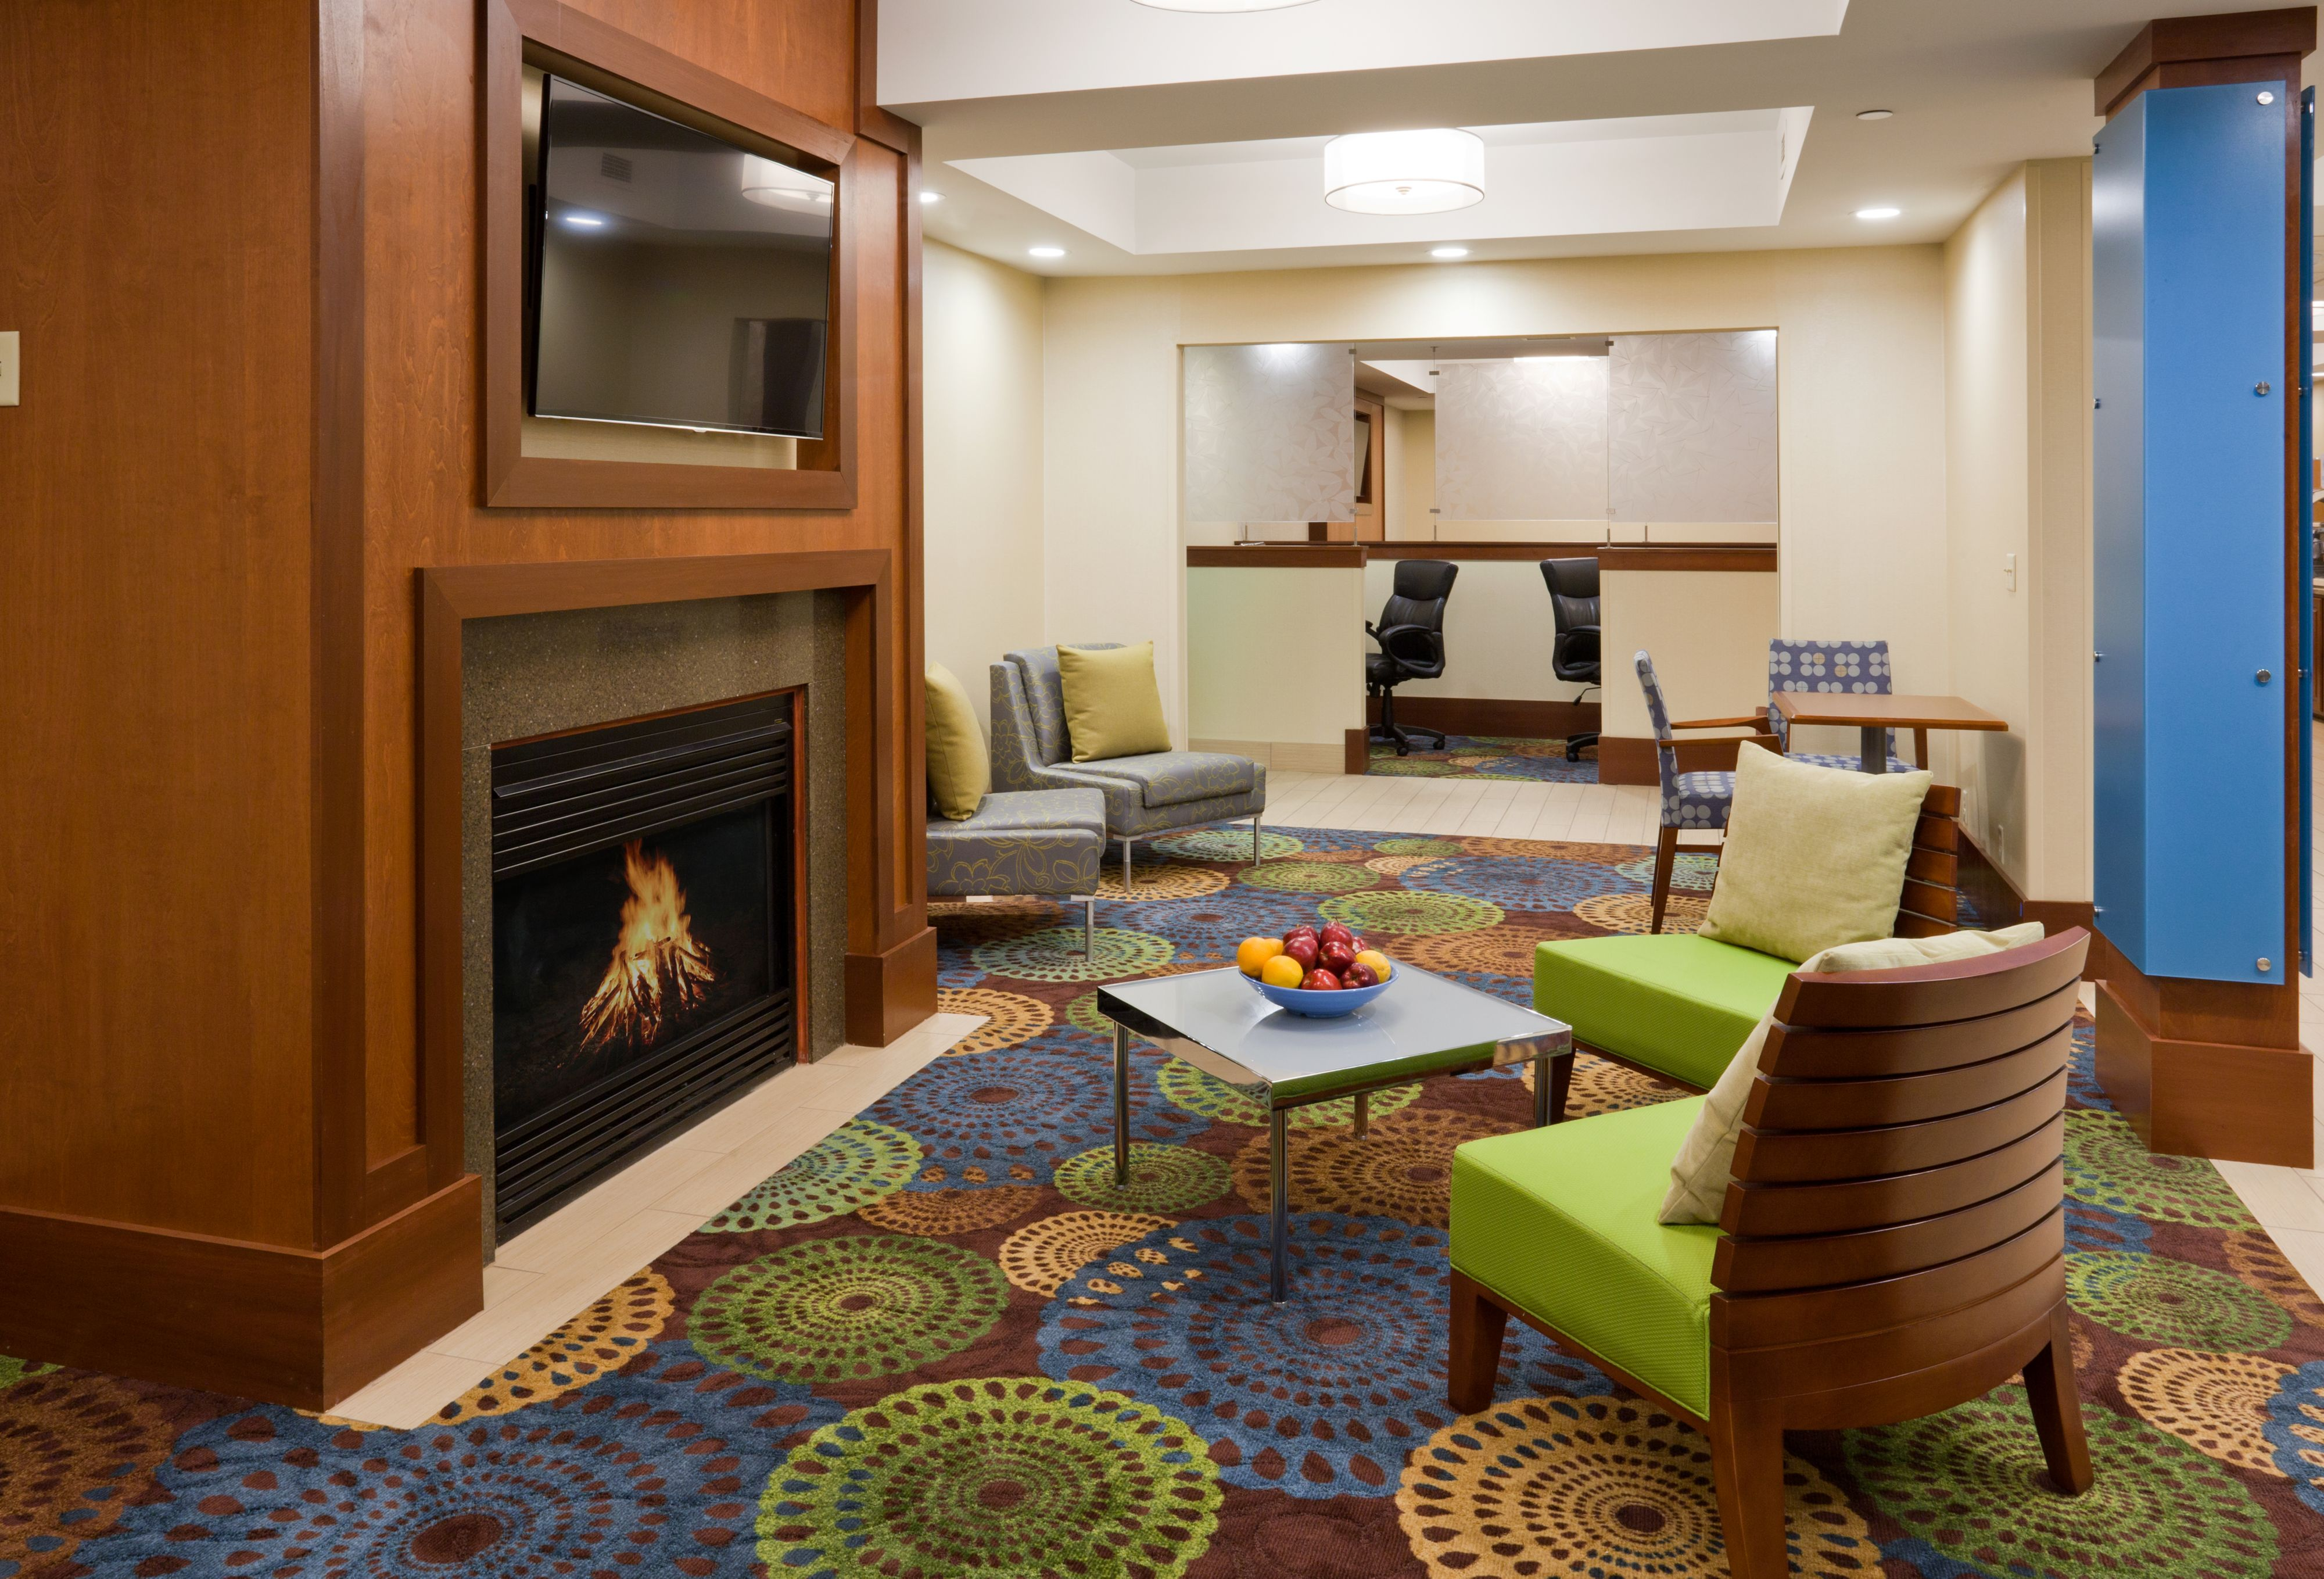 Holiday Inn Express Cedar Rapids (Collins Rd) image 5